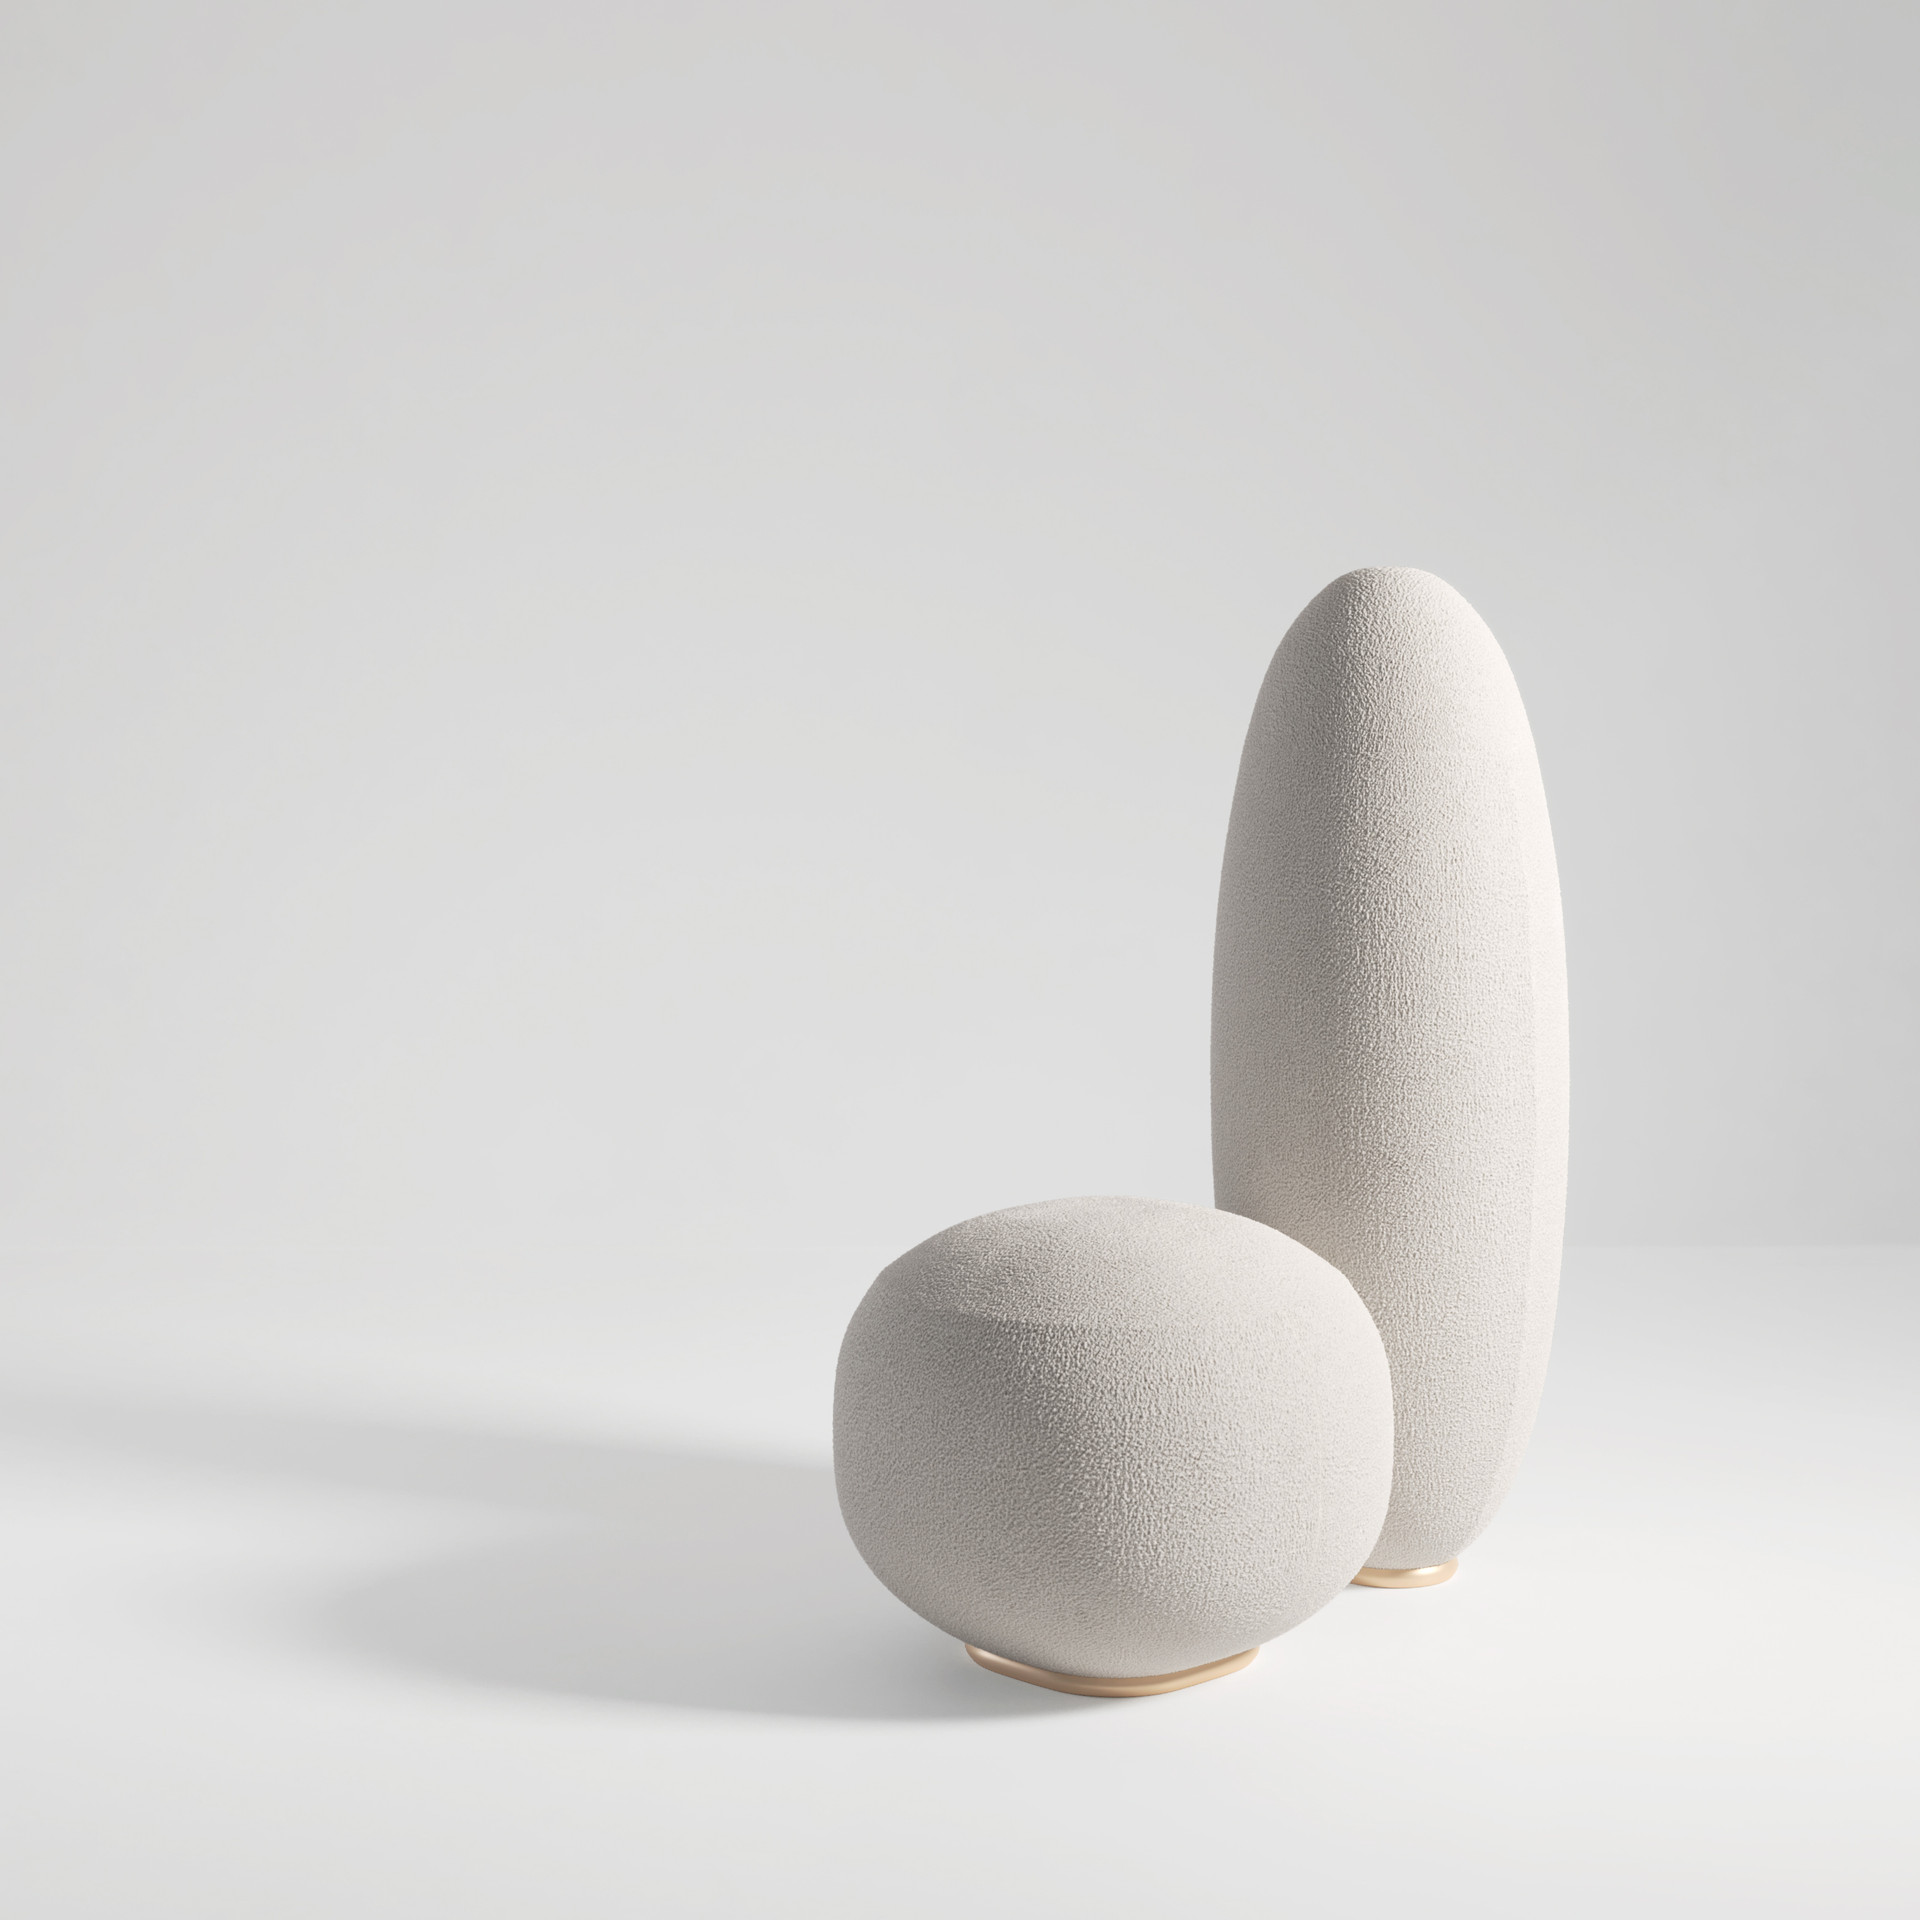 Balancing Rock 01.jpg